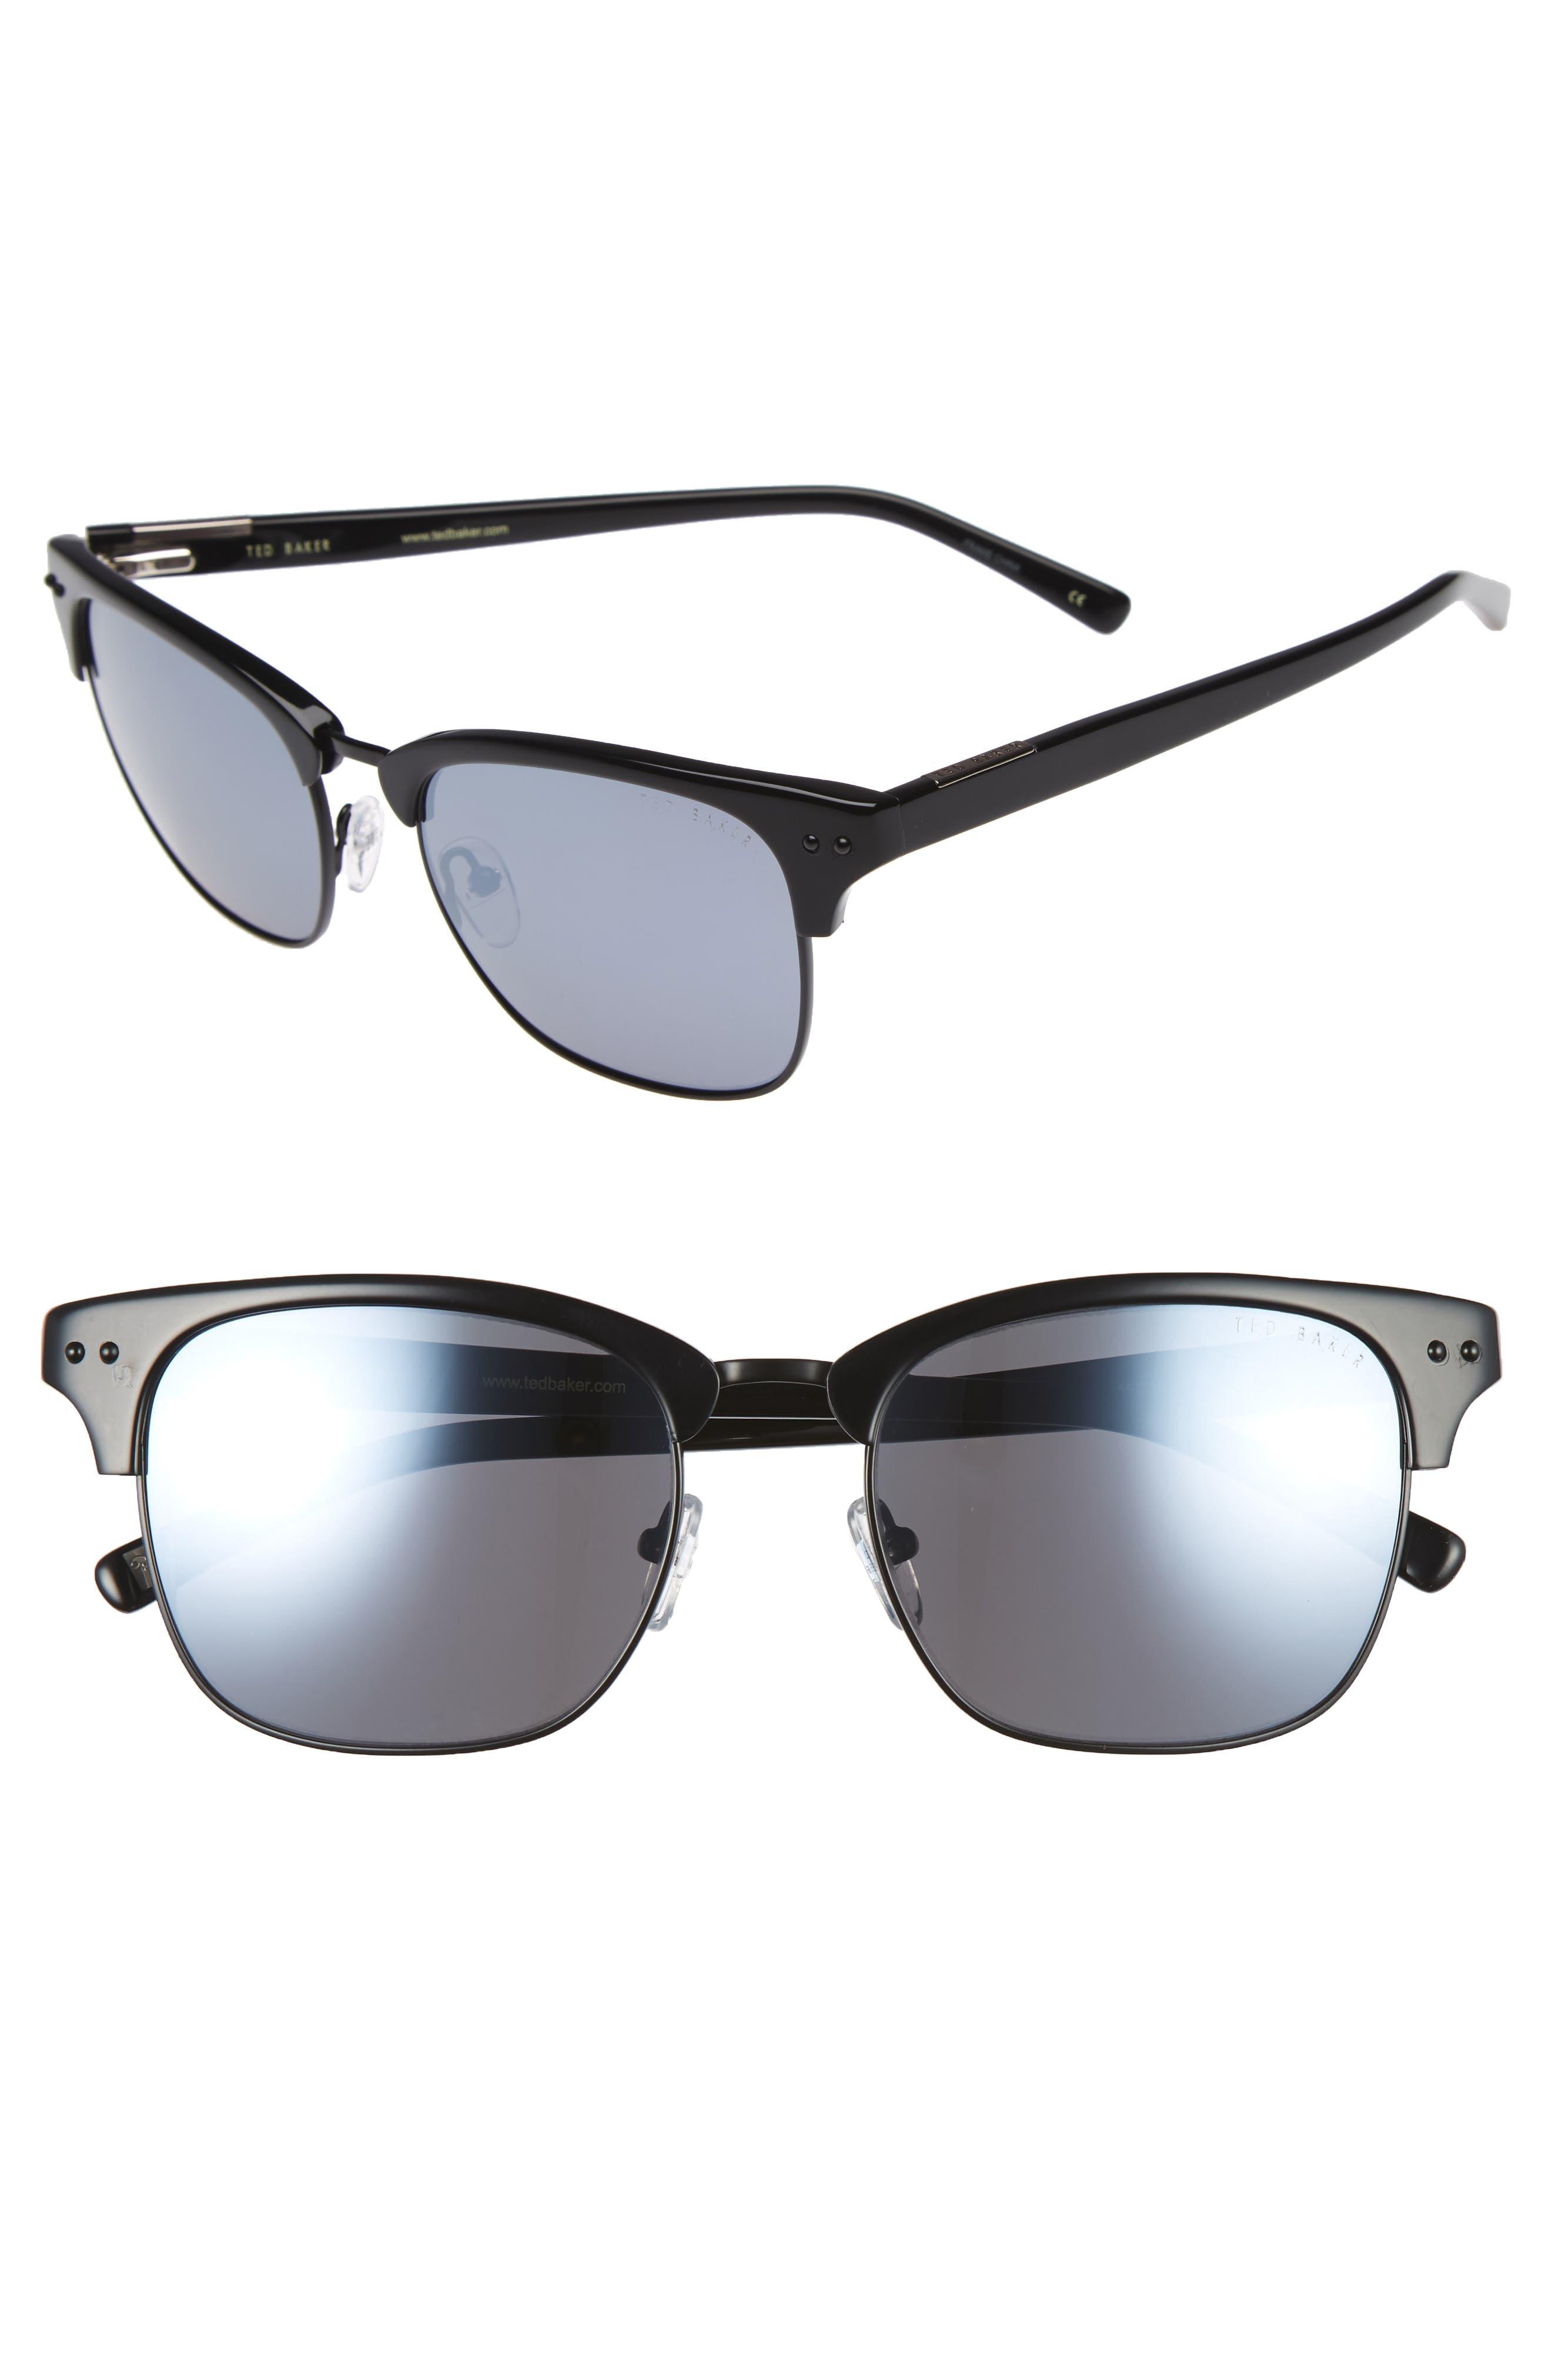 55mm Polarized Browline Sunglasses,                         Main,                         color, Black